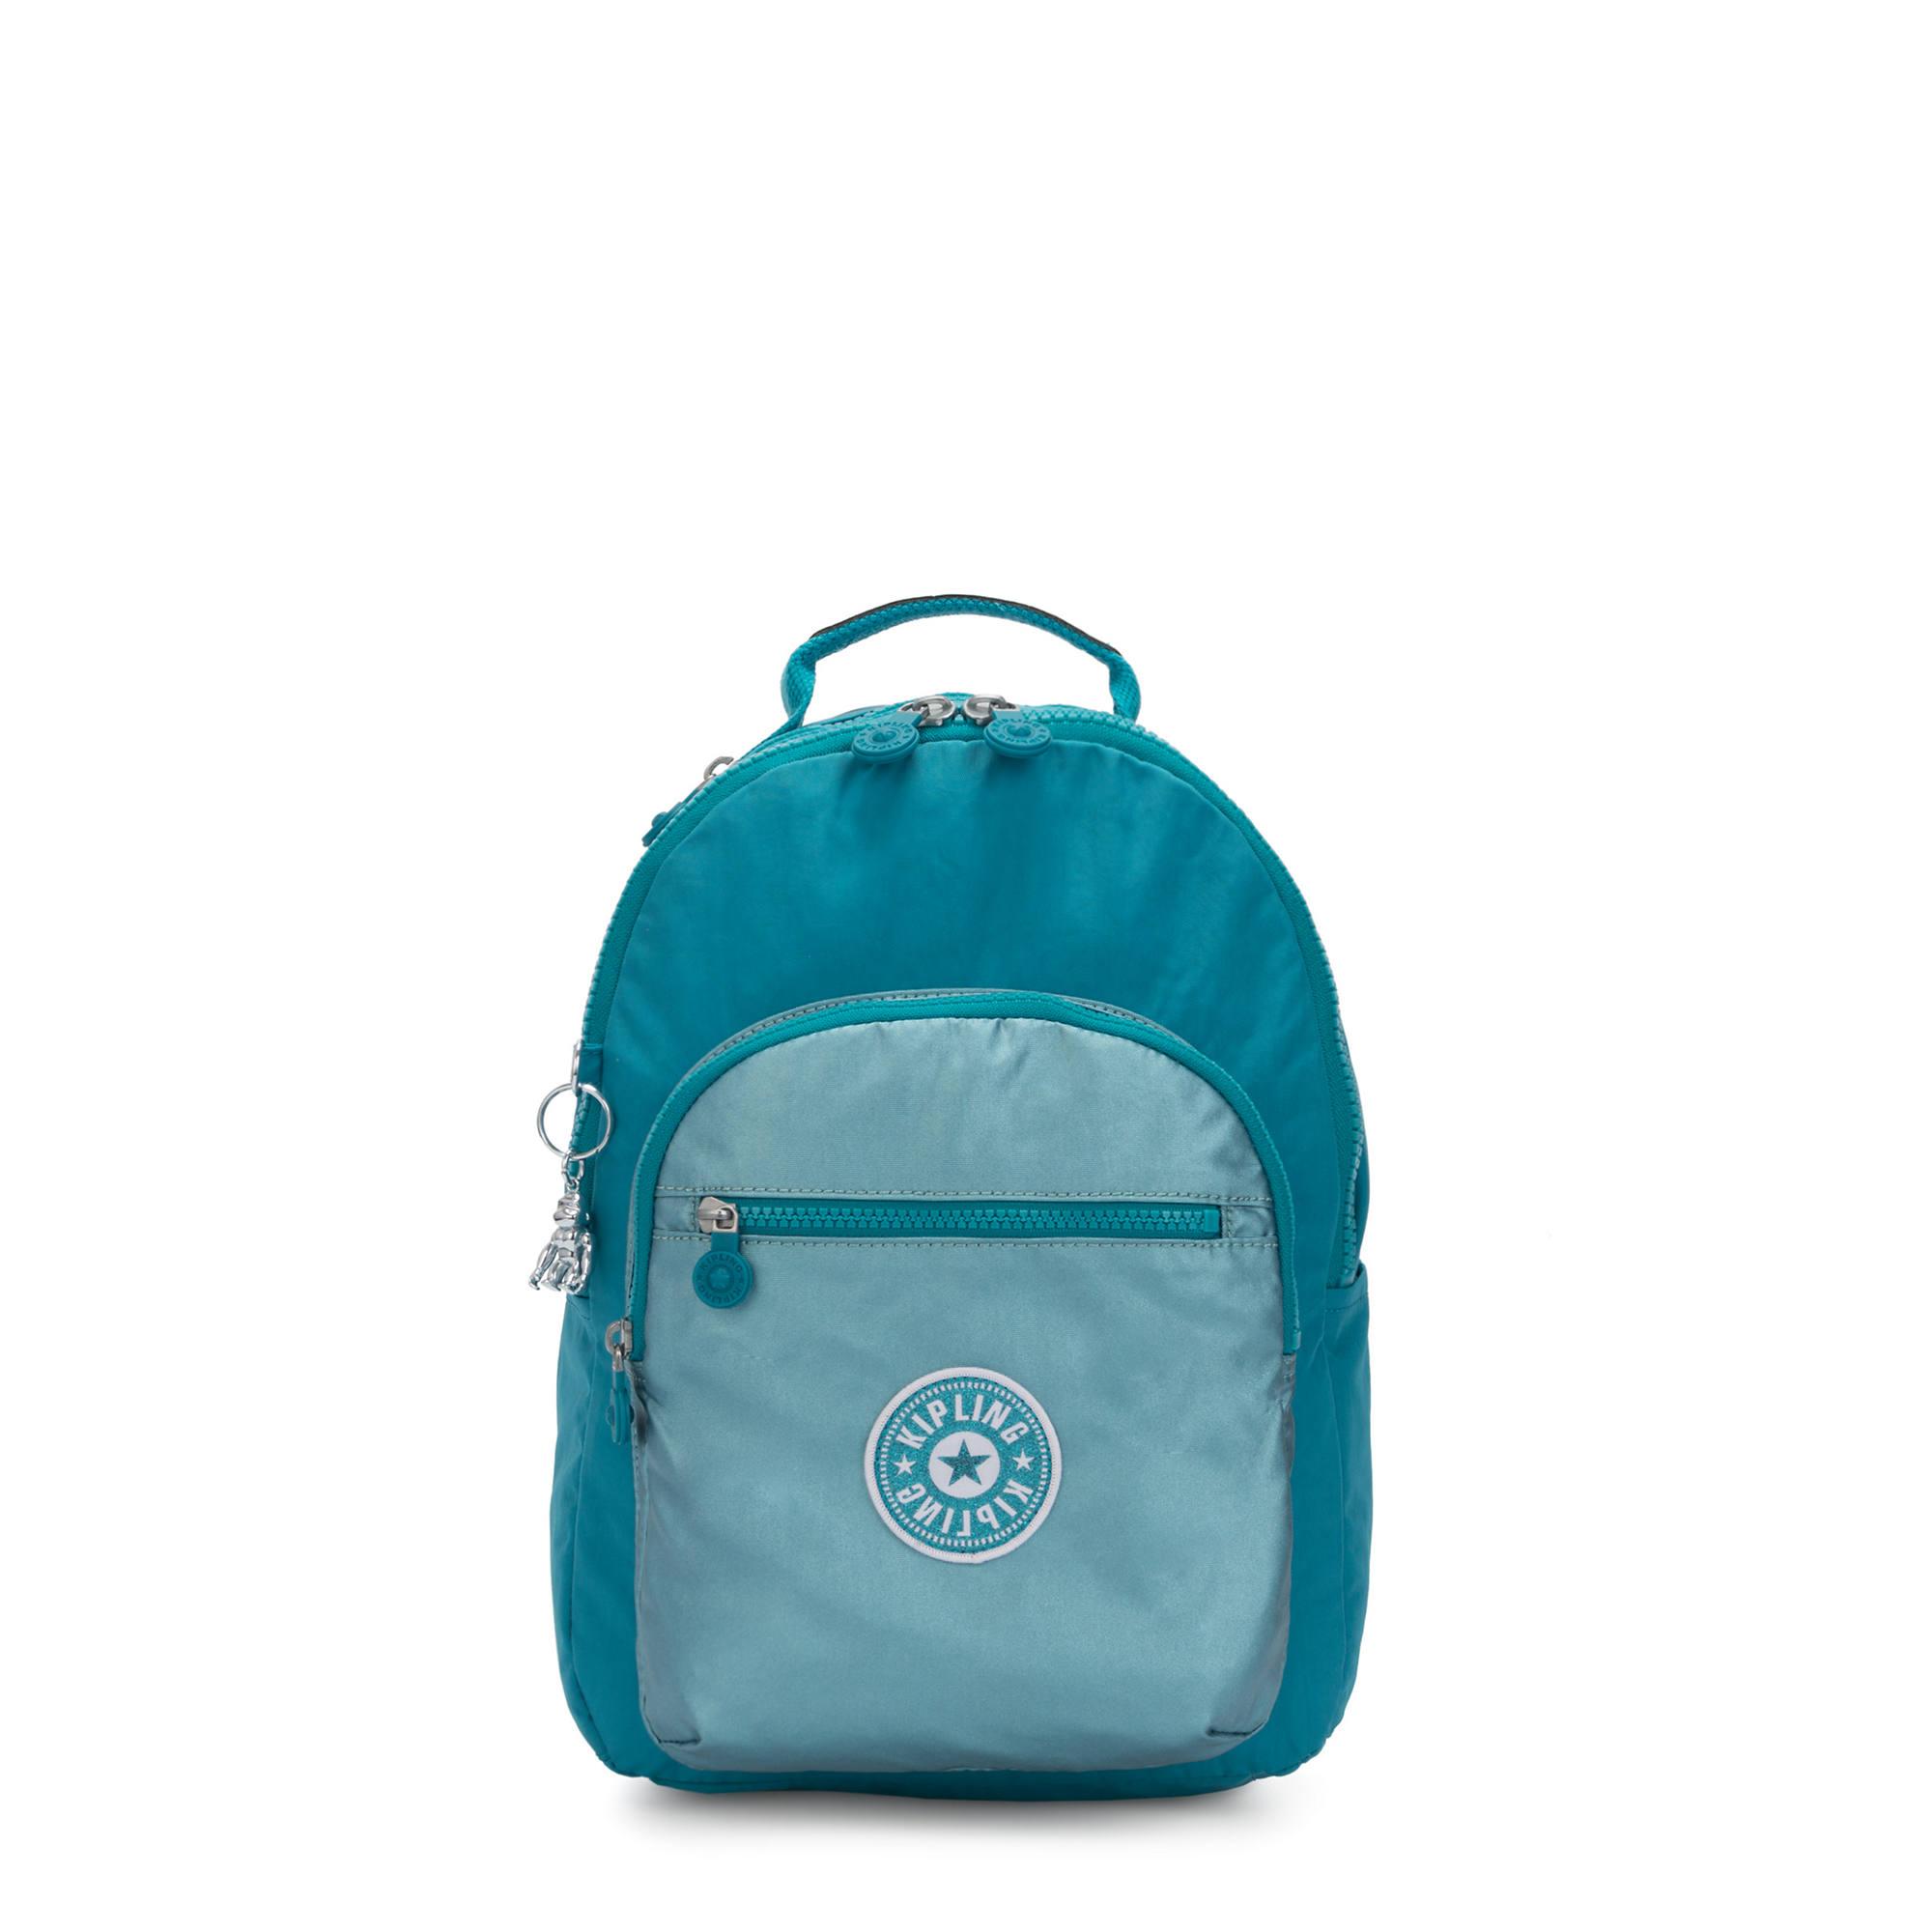 Seoul Small Metallic Tablet Backpack,Turquoise Sea Metallic Block,large-zoomed